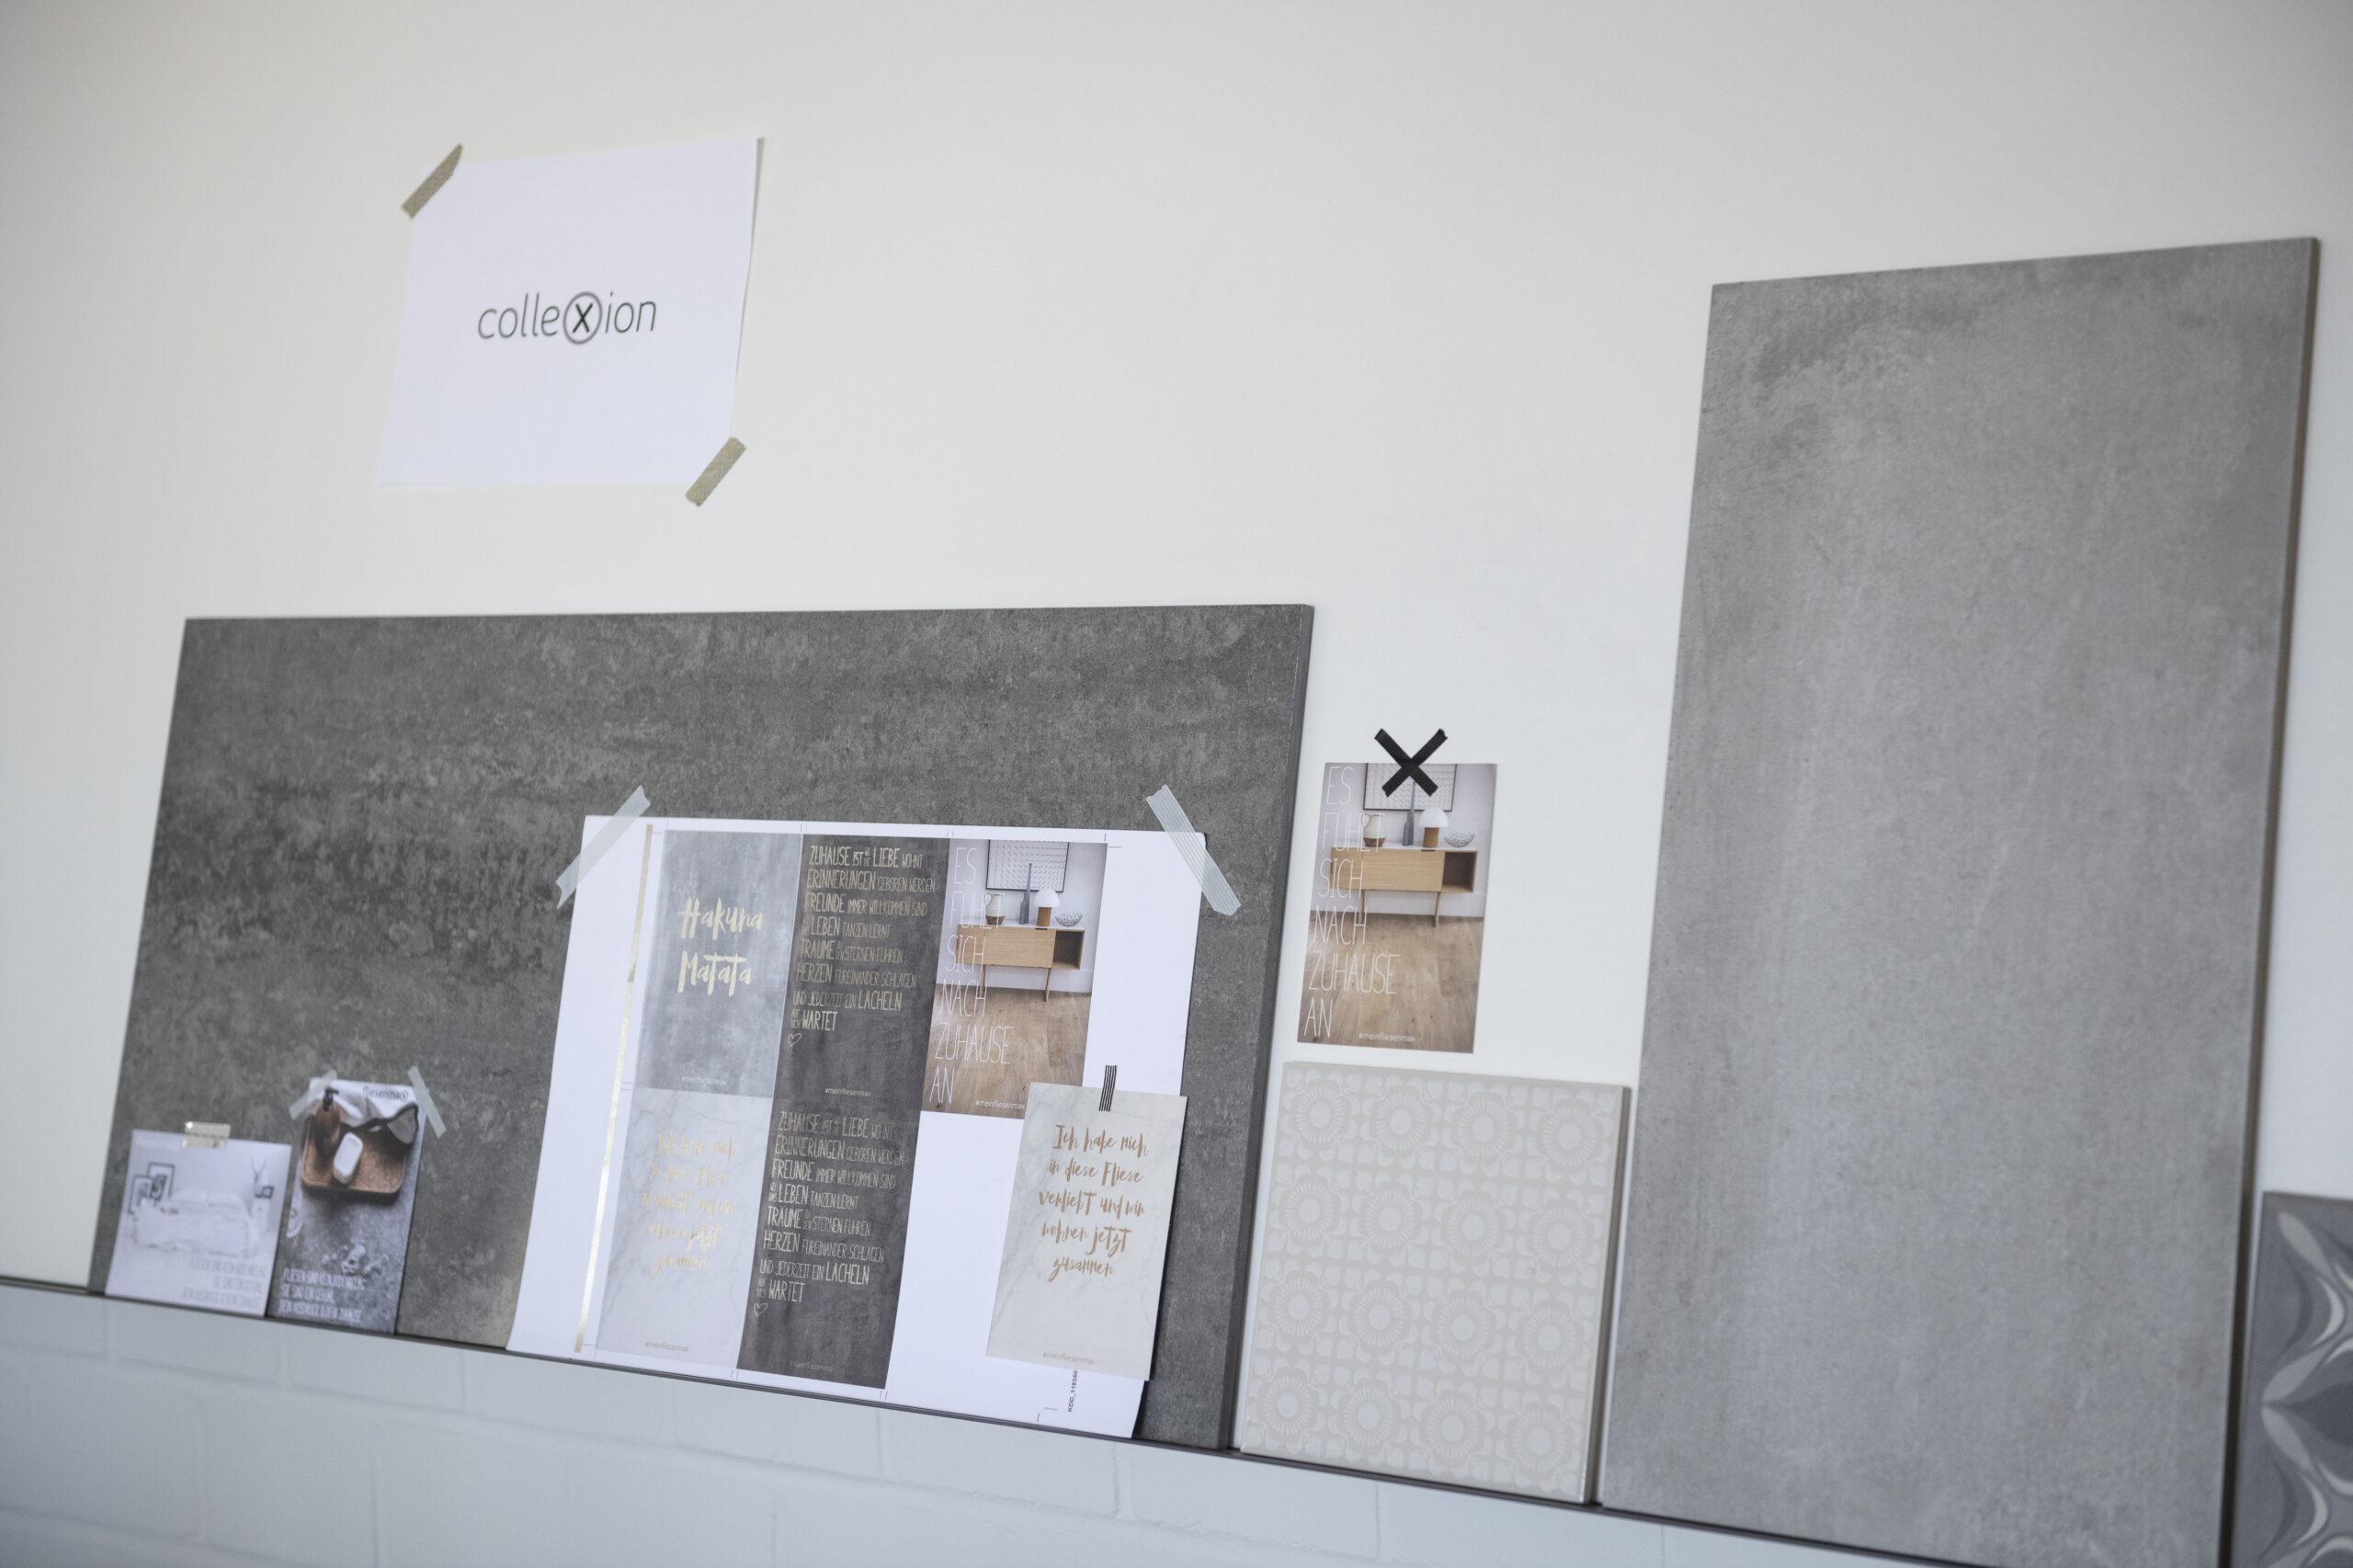 Collexion by Fliesenmax